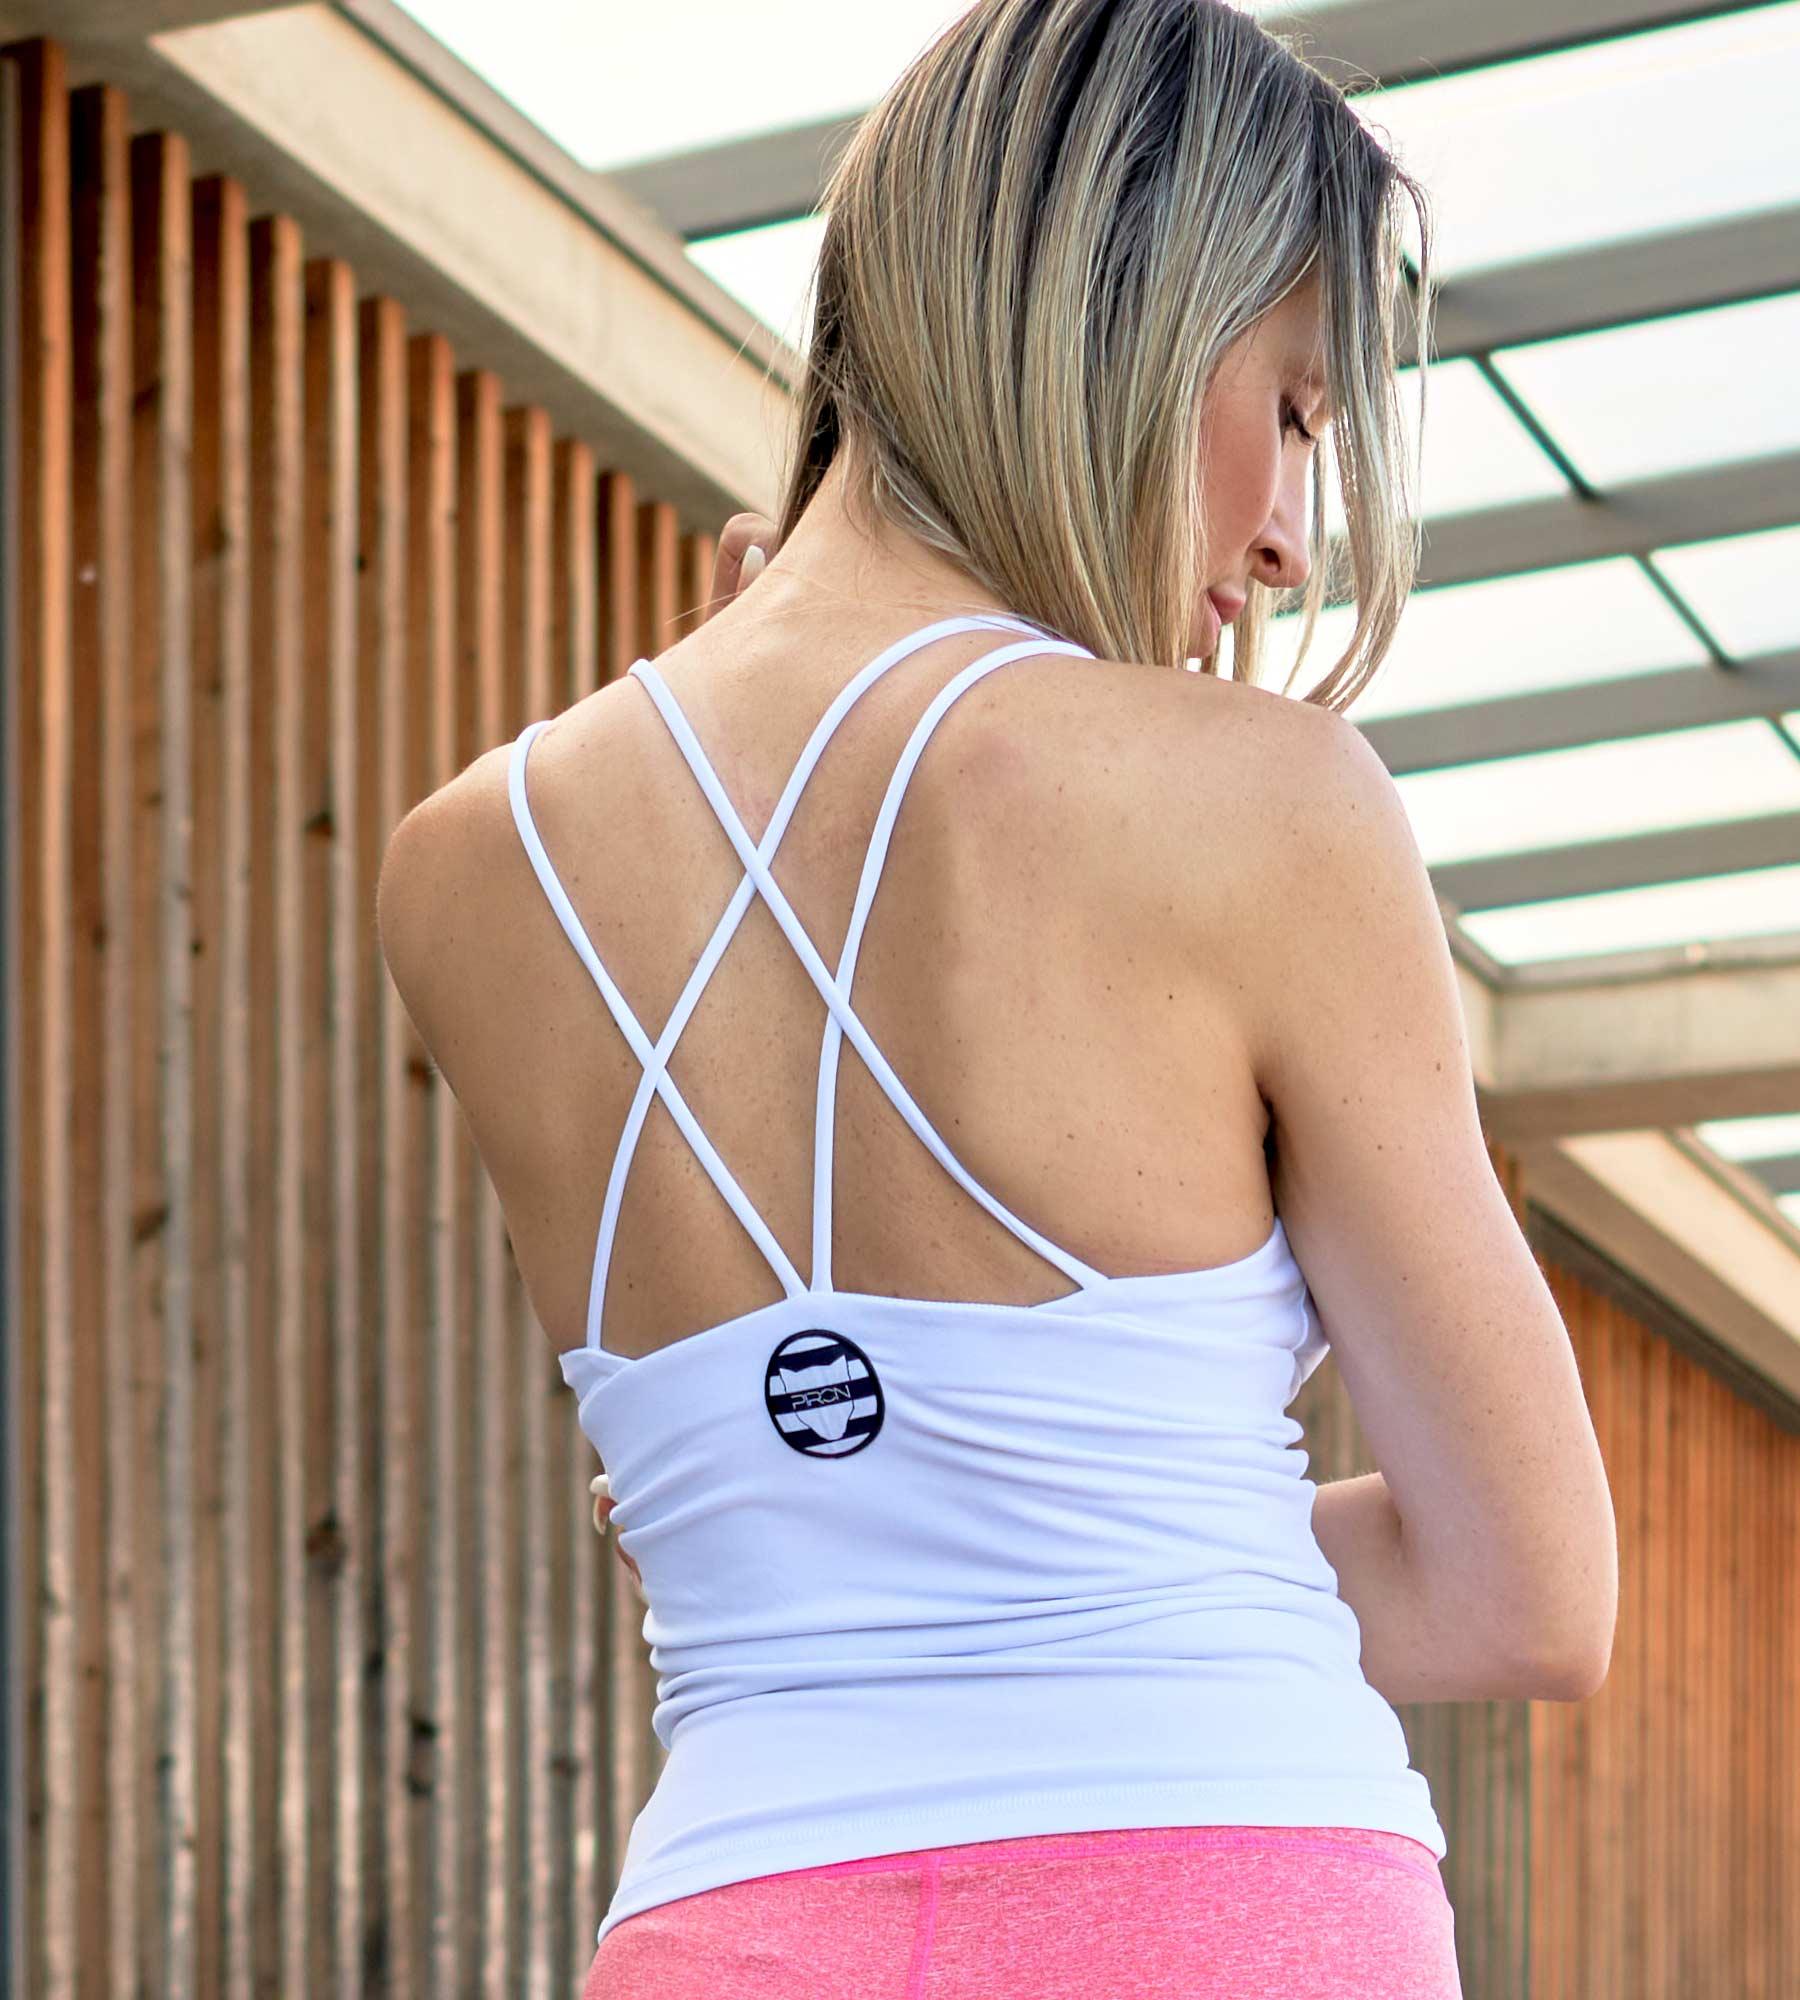 Sportbekleidung Yoga Outfit Fitness Outfit Sportswear Shirt Oberteil Damen